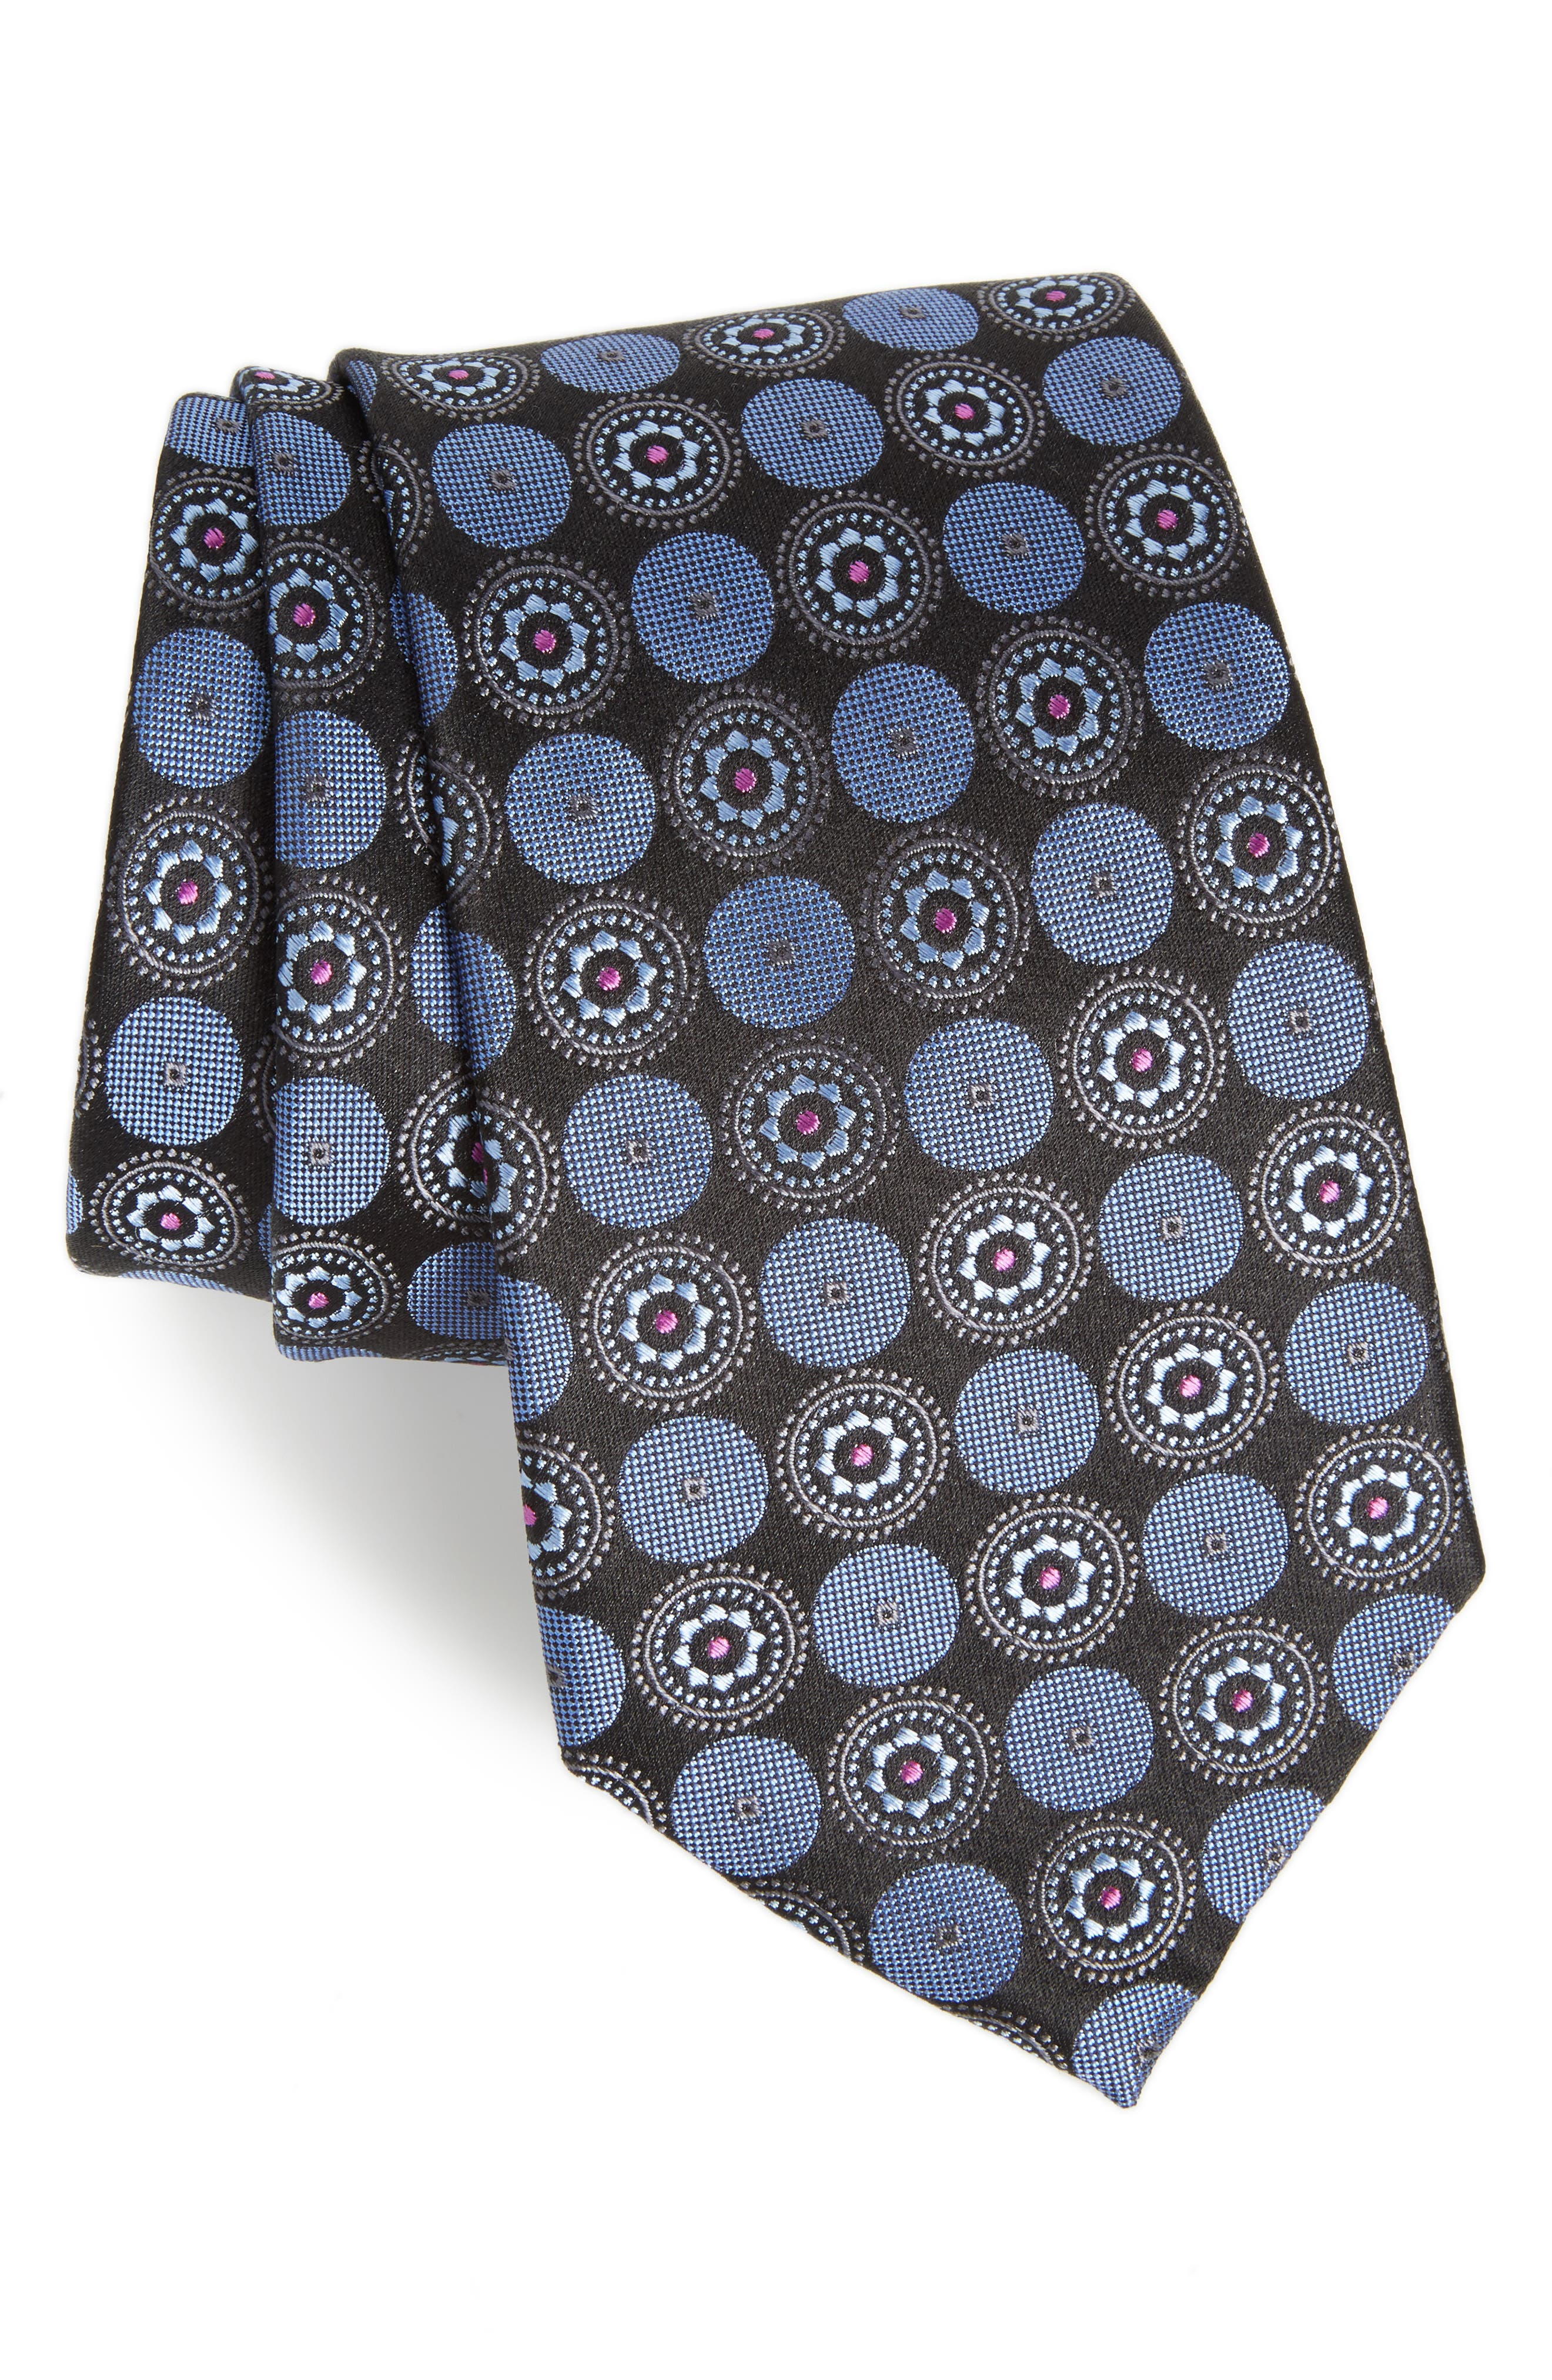 Main Image - Nordstrom Men's Shop Old English Medallion Silk Tie